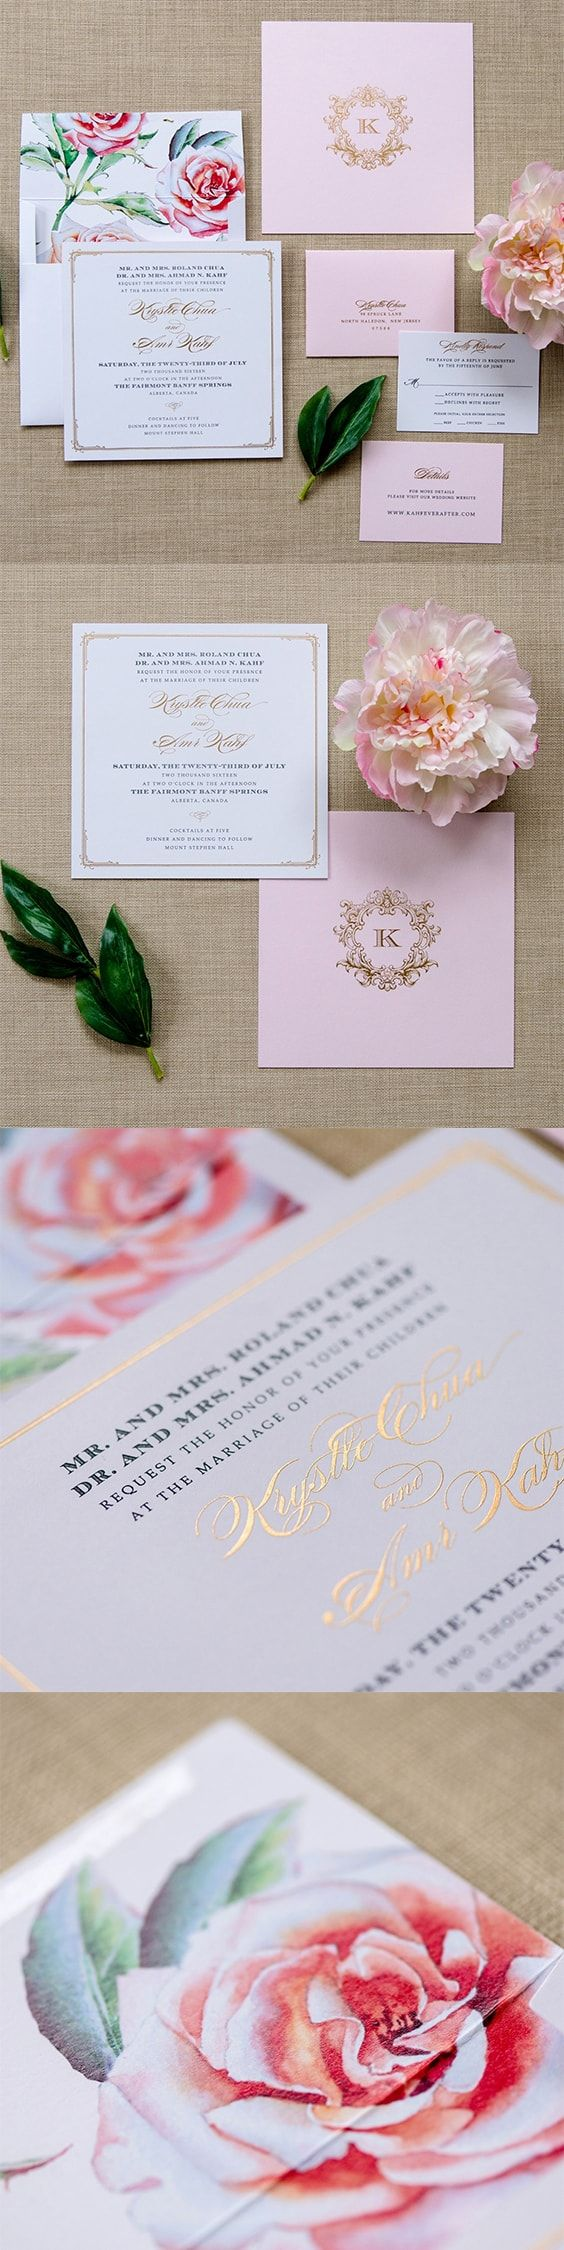 summer wedding invitation wording%0A Floral Wedding Invitation  Krystle Wedding Invitation